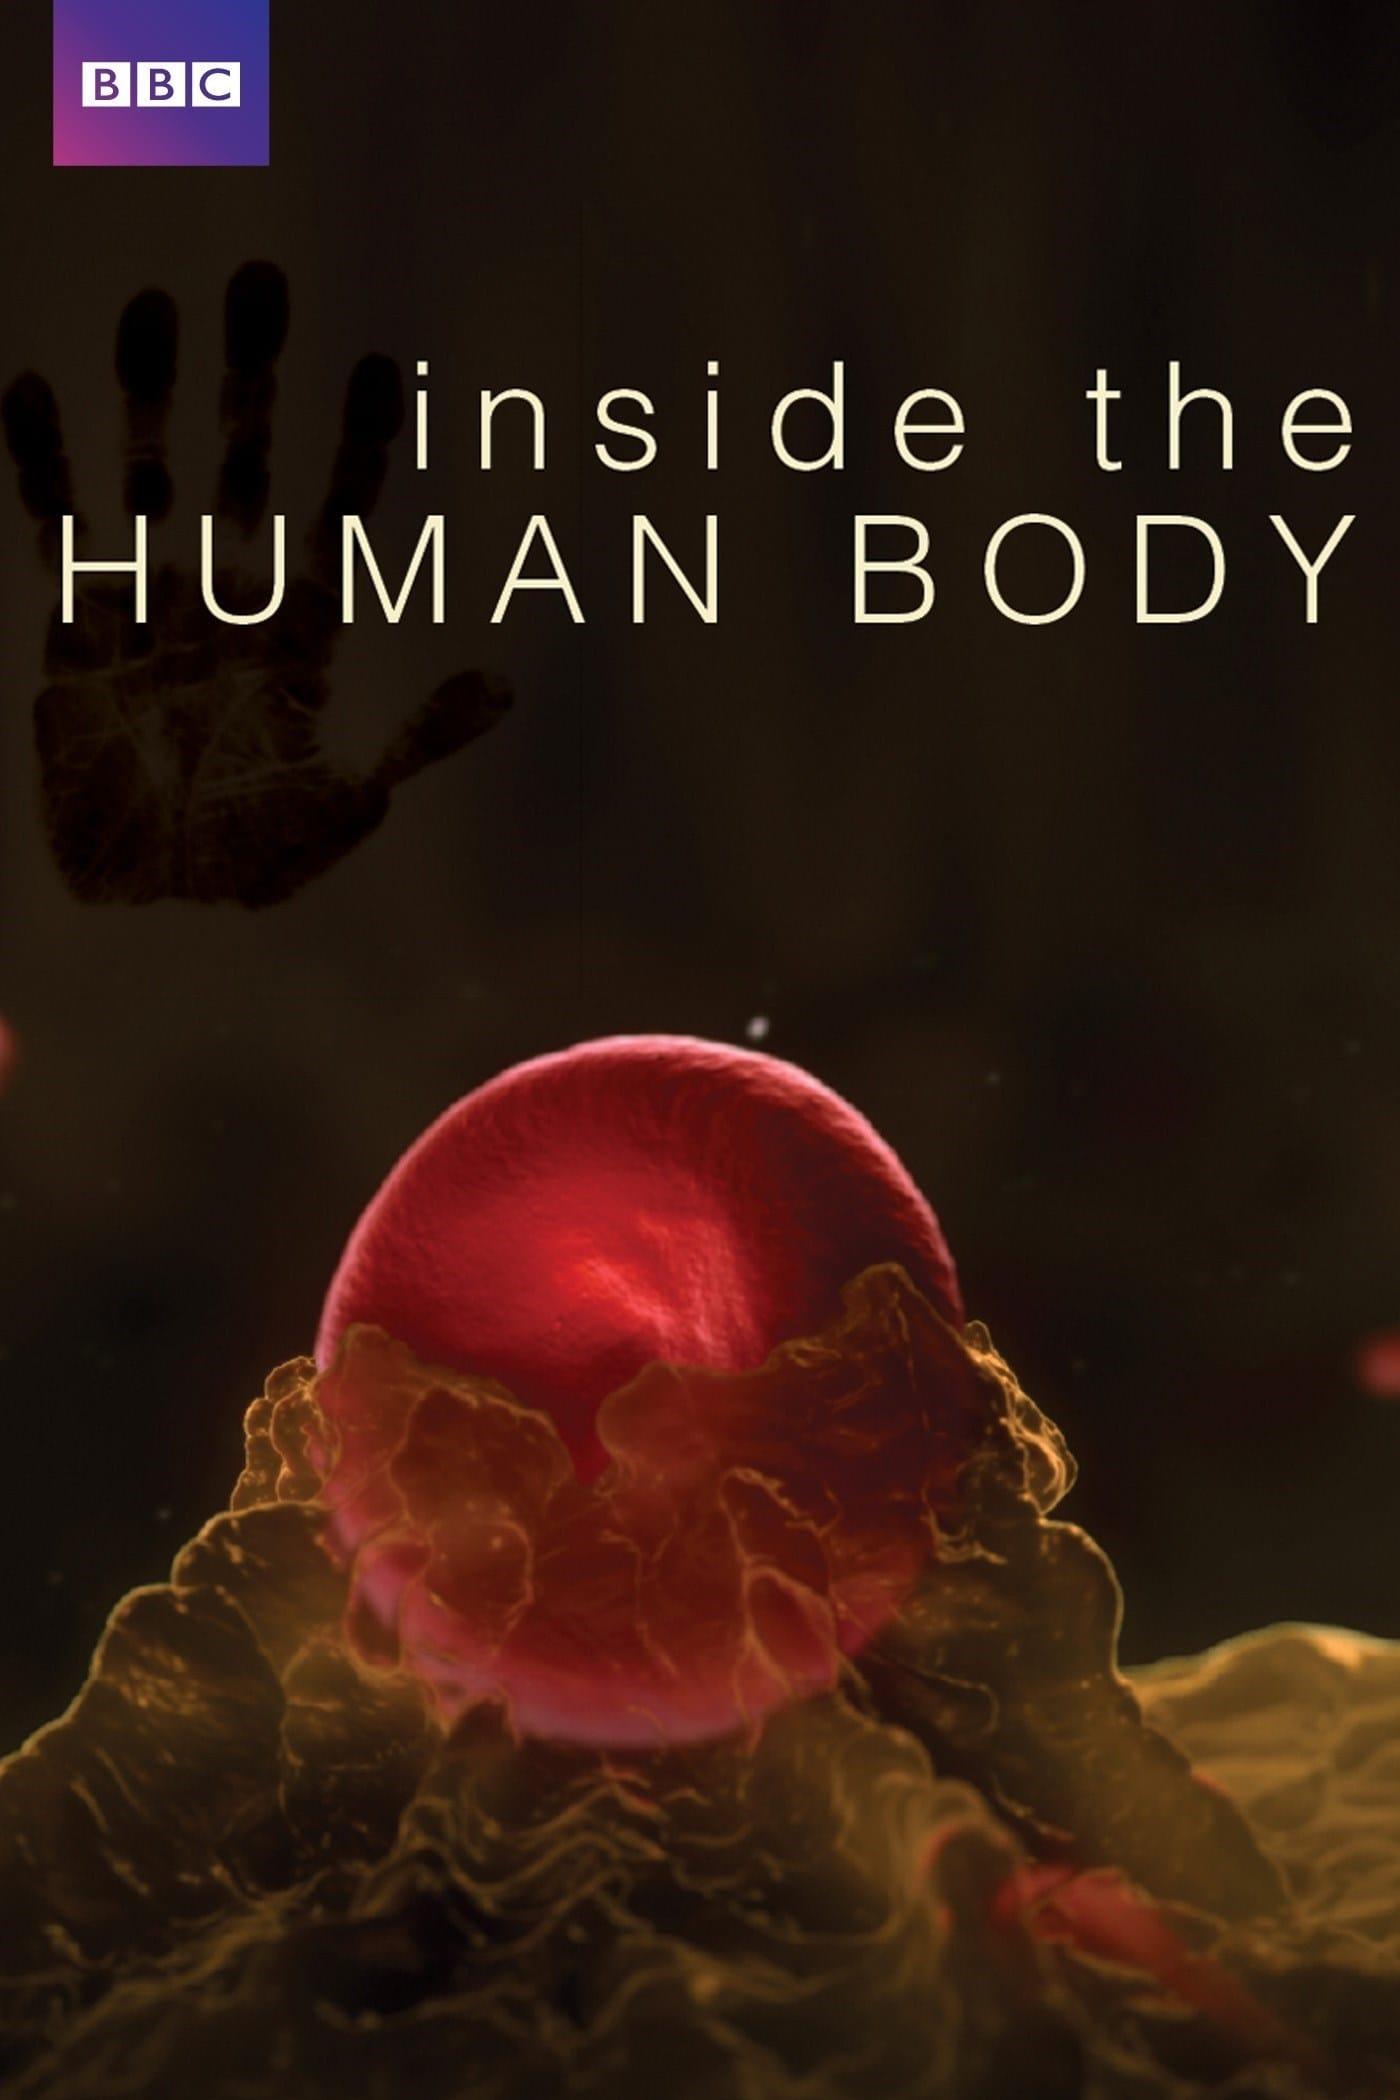 Inside the Human Body kapak